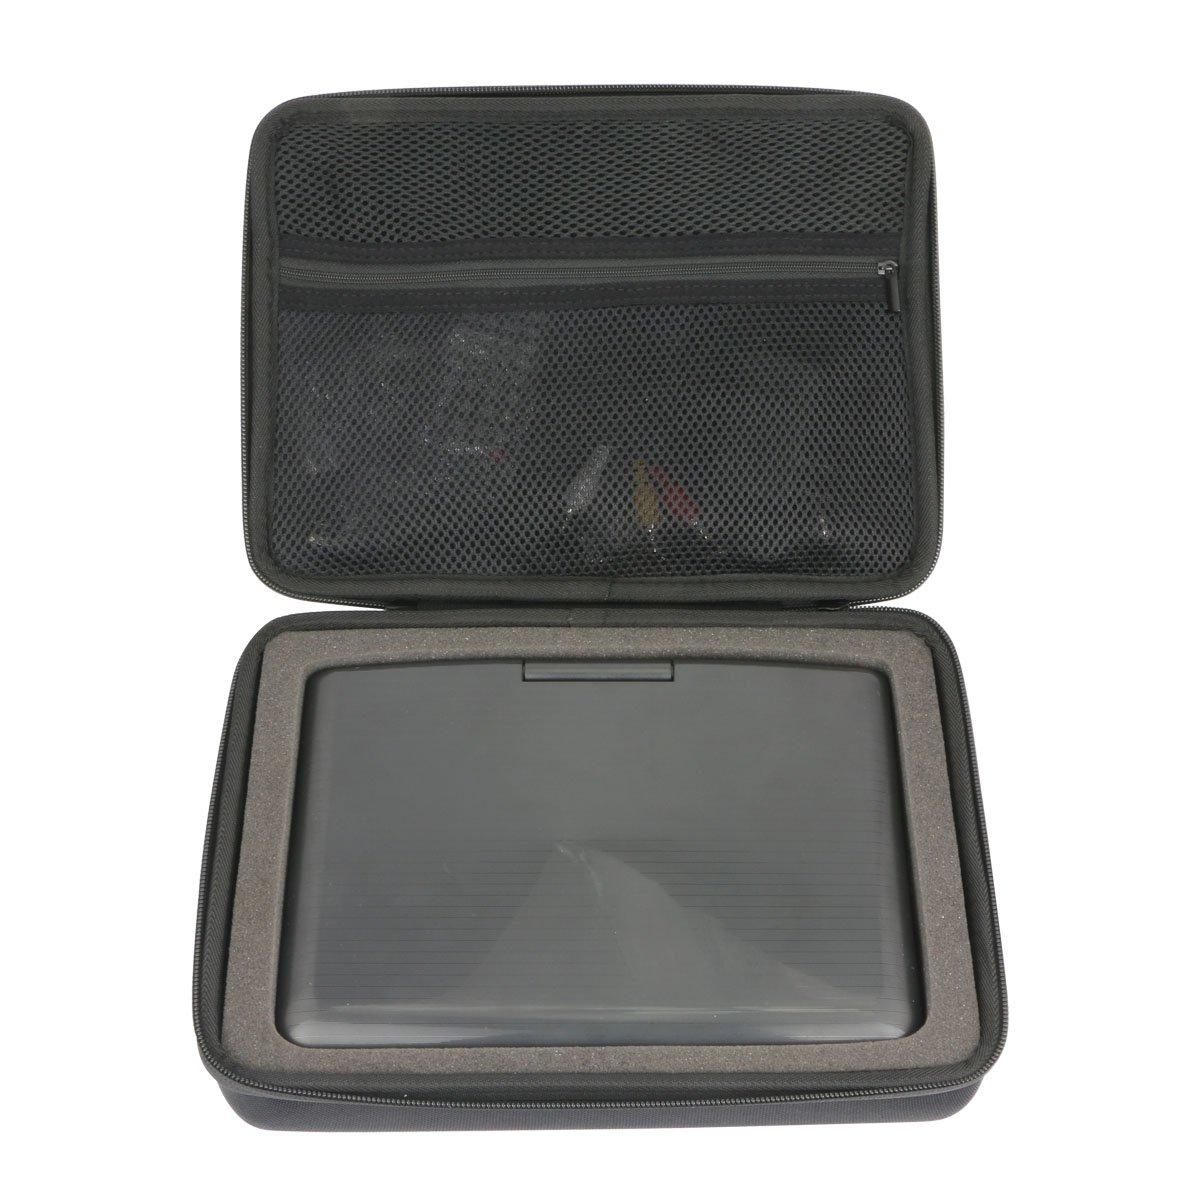 Hard Case for Sylvania 9-Inch Swivel Screen Portable DVD/CD/MP3 Player by Khanka